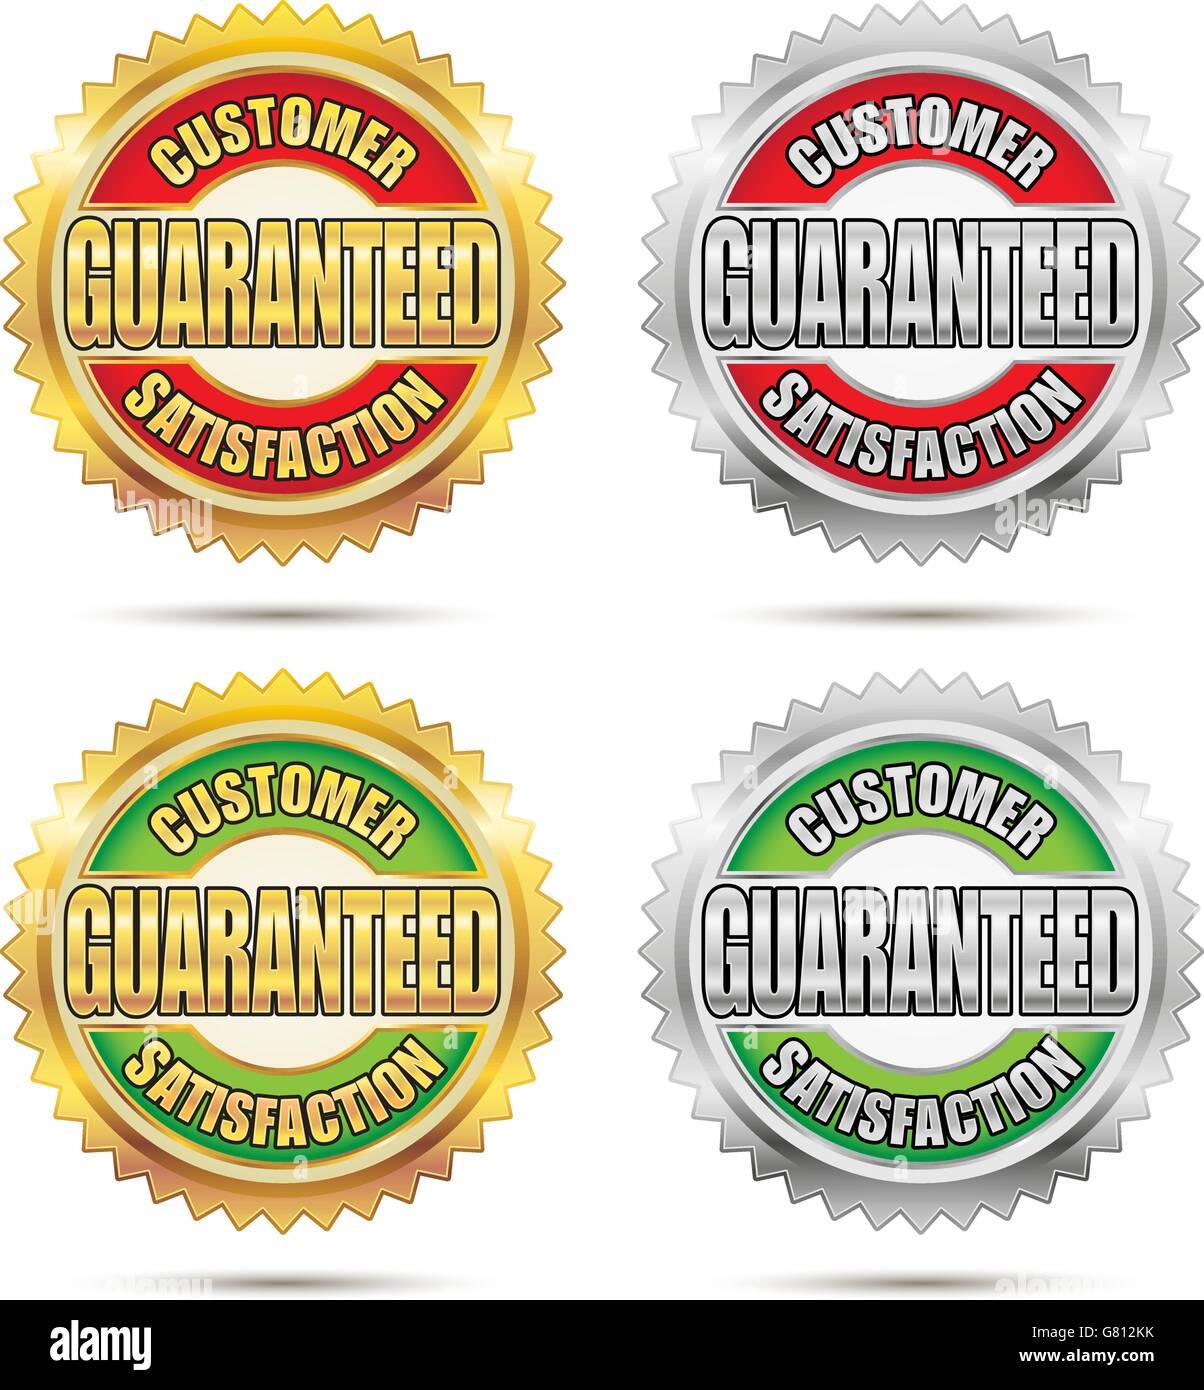 Vector Seal of Customer Satisfaction Guaranteed - Stock Vector